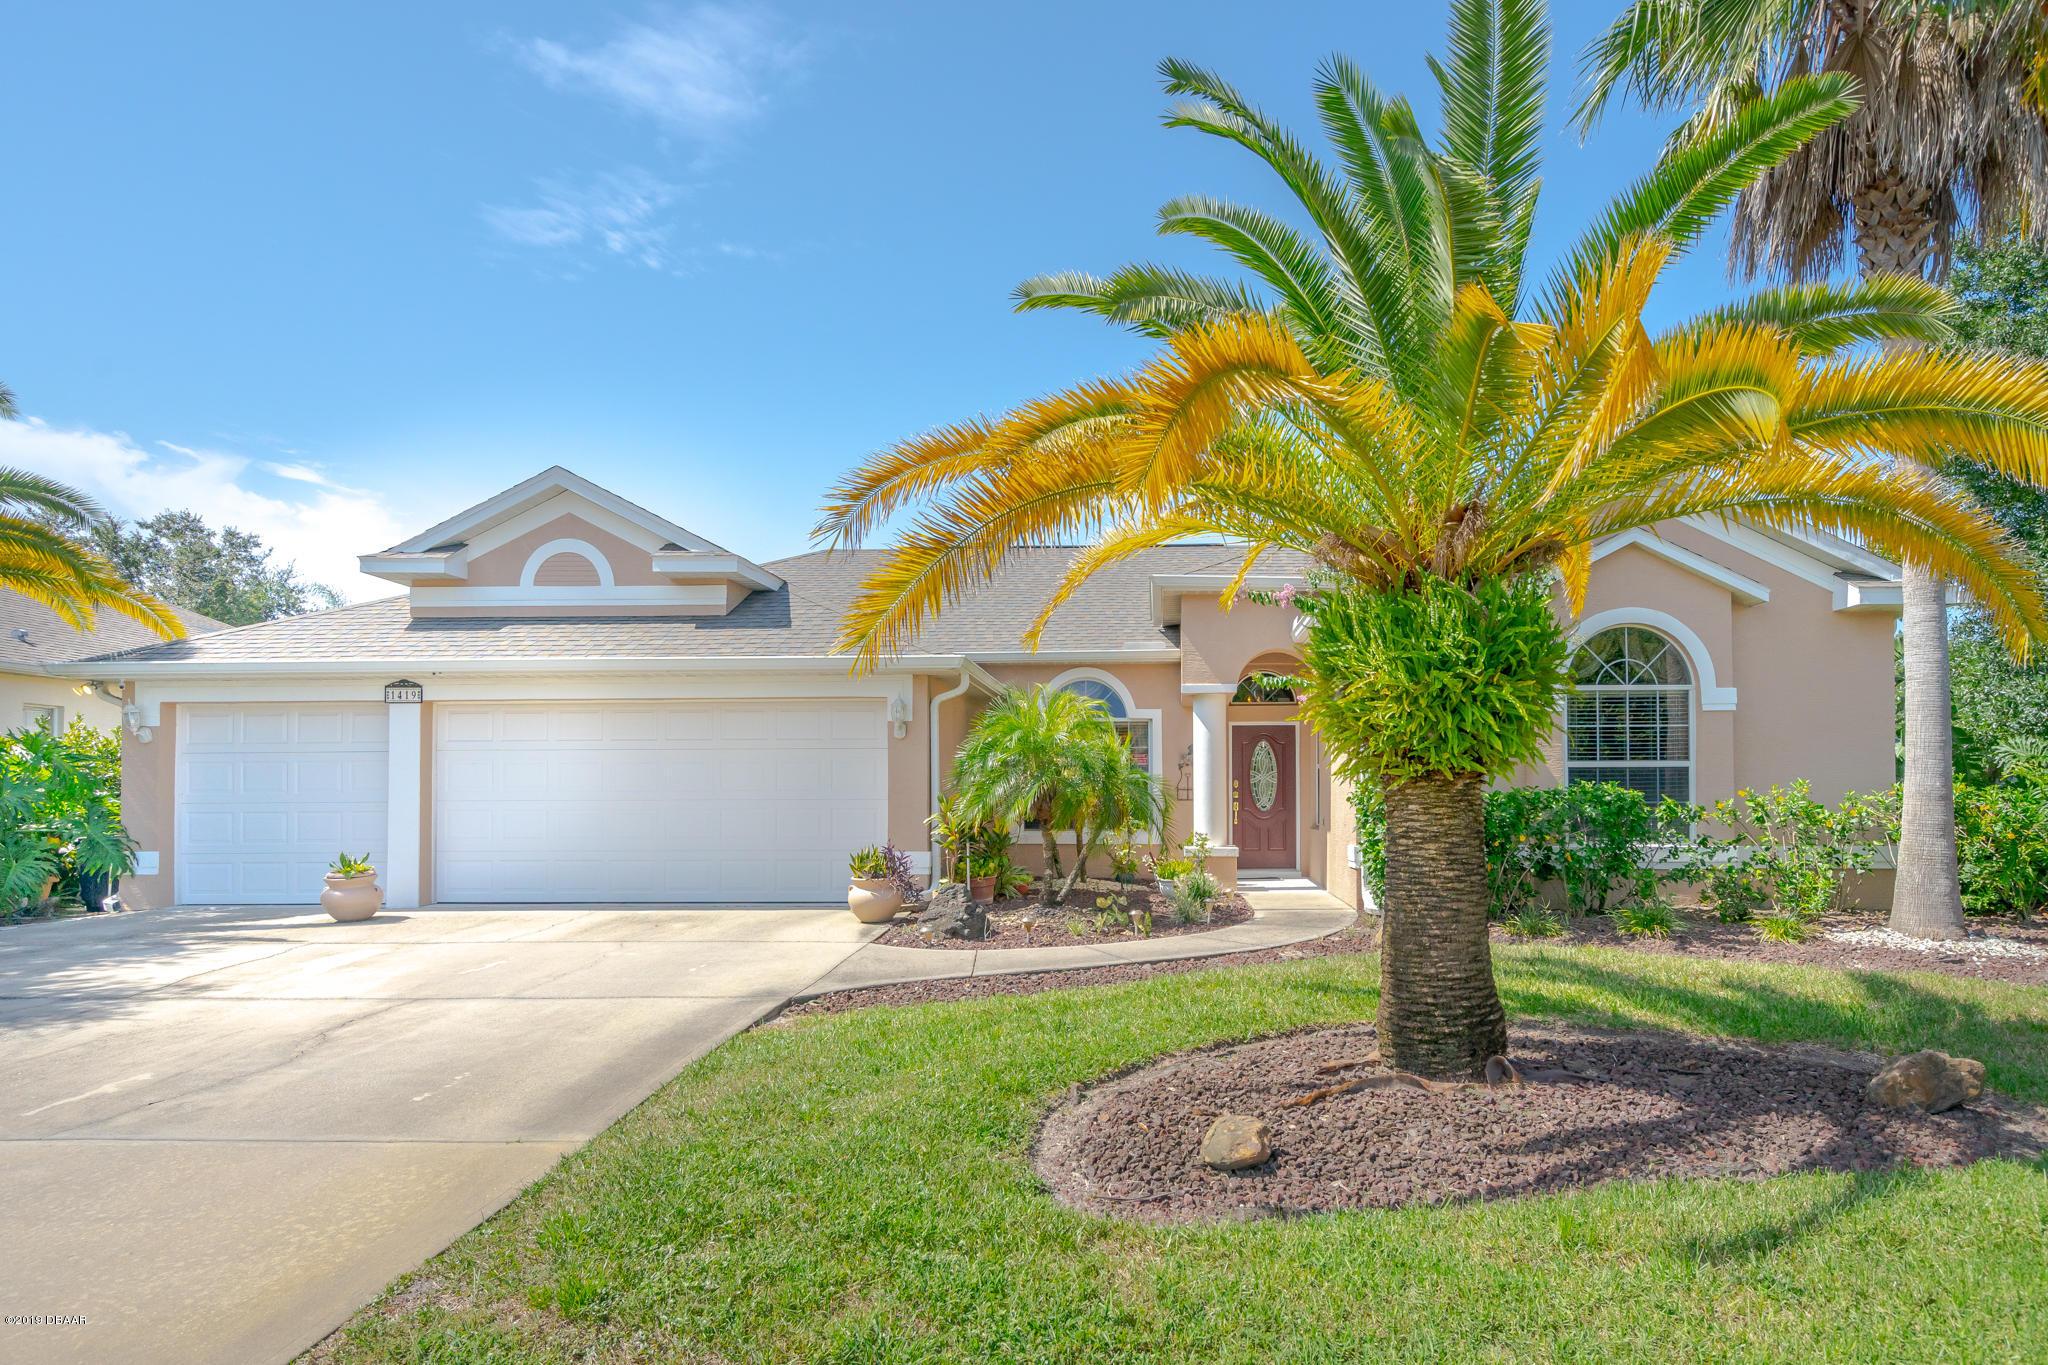 Photo of 1419 Richel Drive, Port Orange, FL 32129